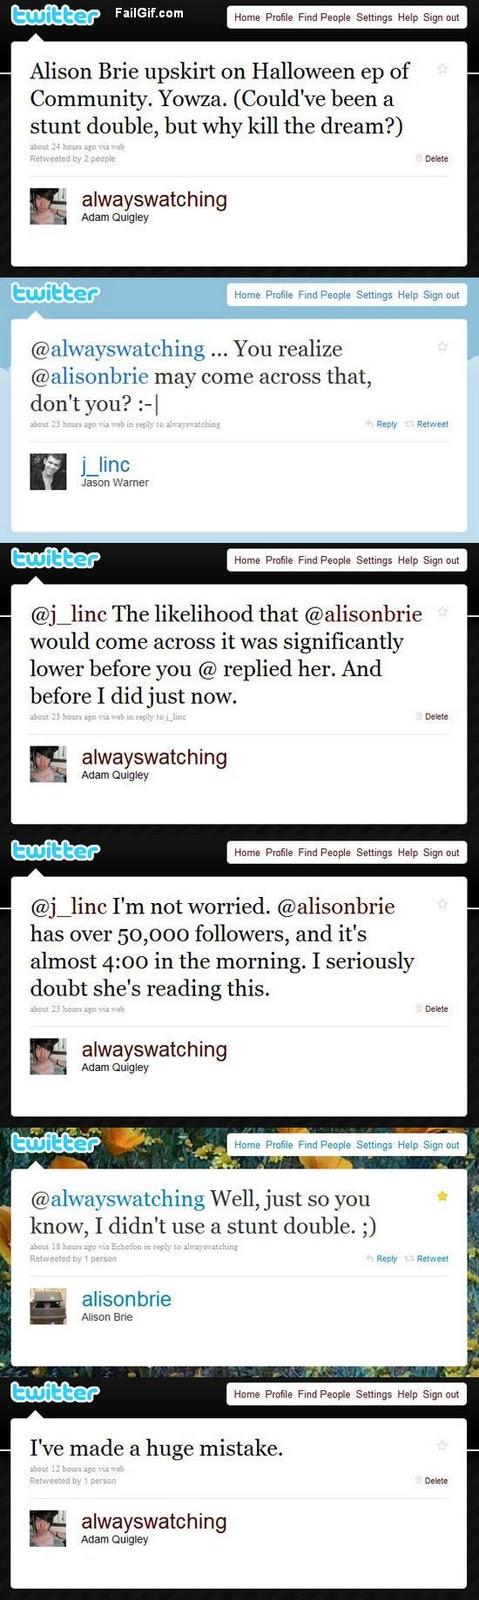 alison brie twitter pics. alison brie twitter. alison